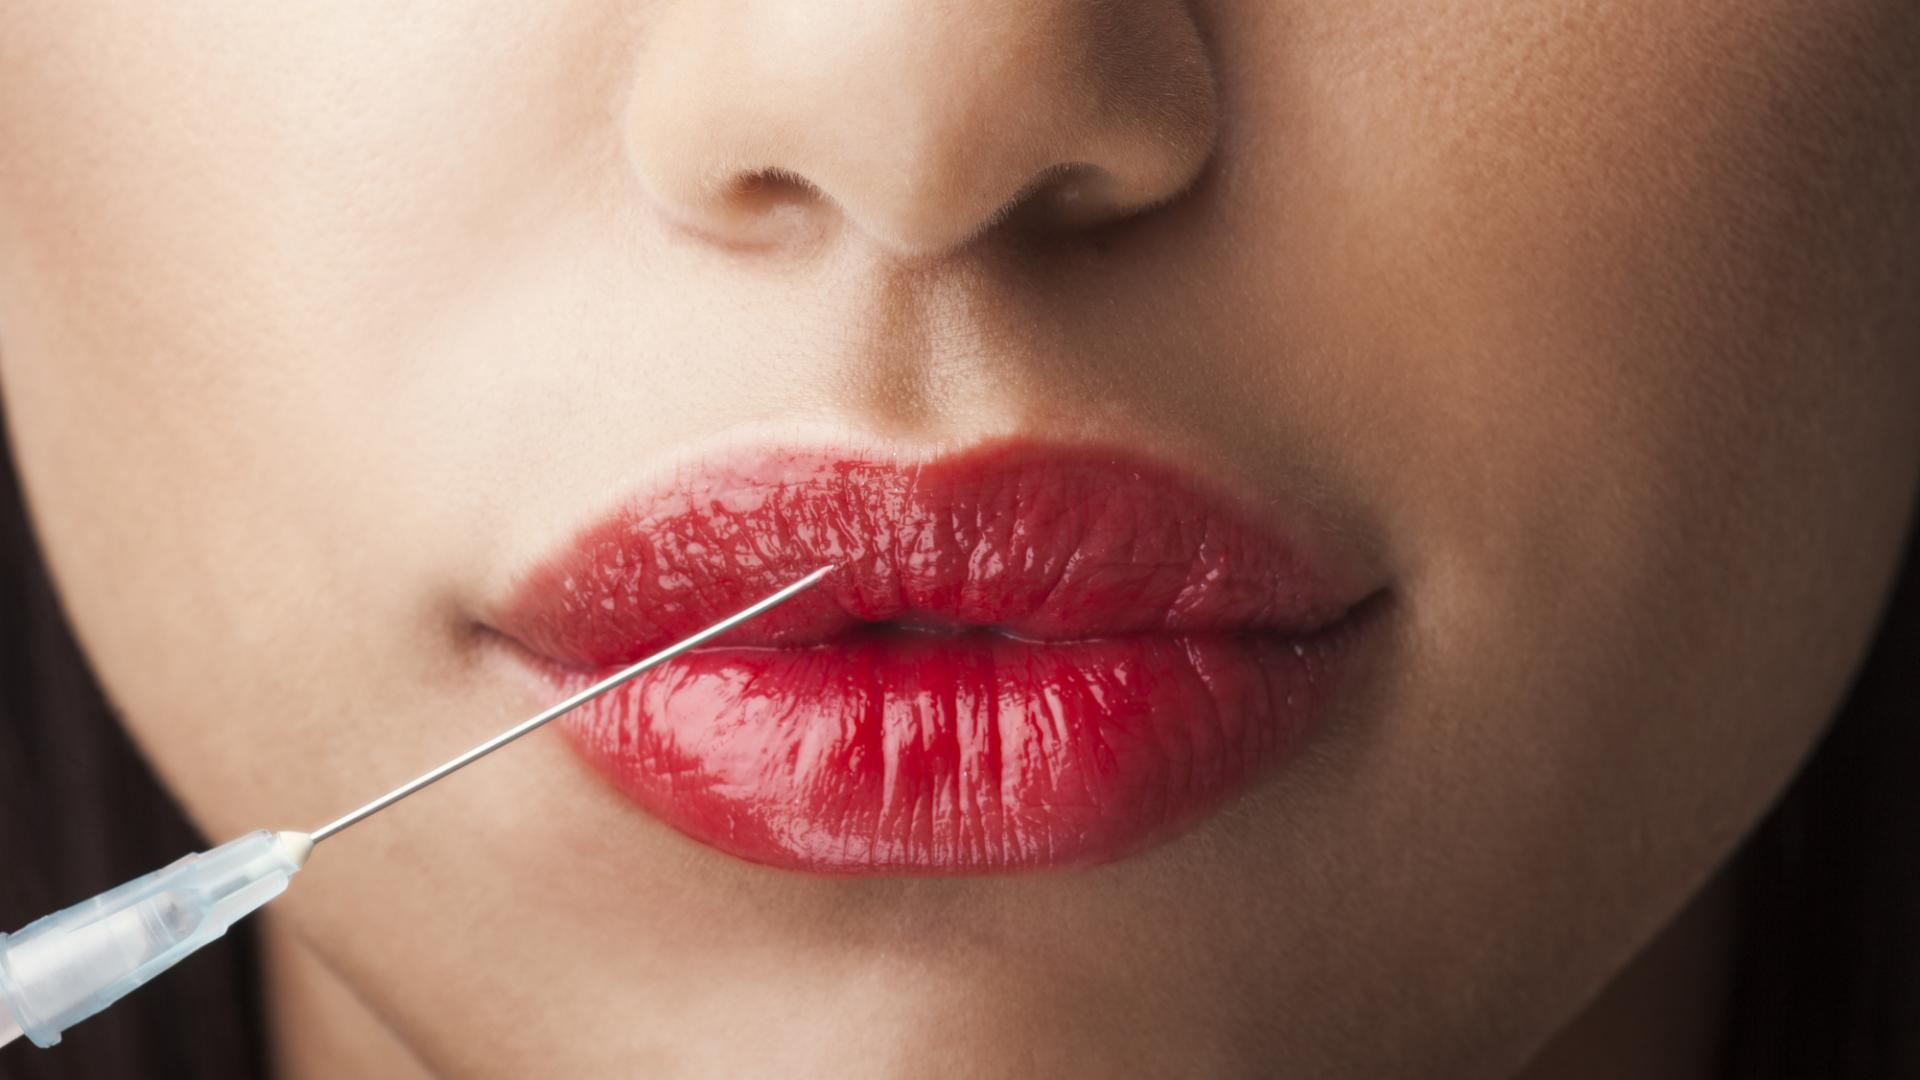 Botoxbehandlung Lippen aufspritzen